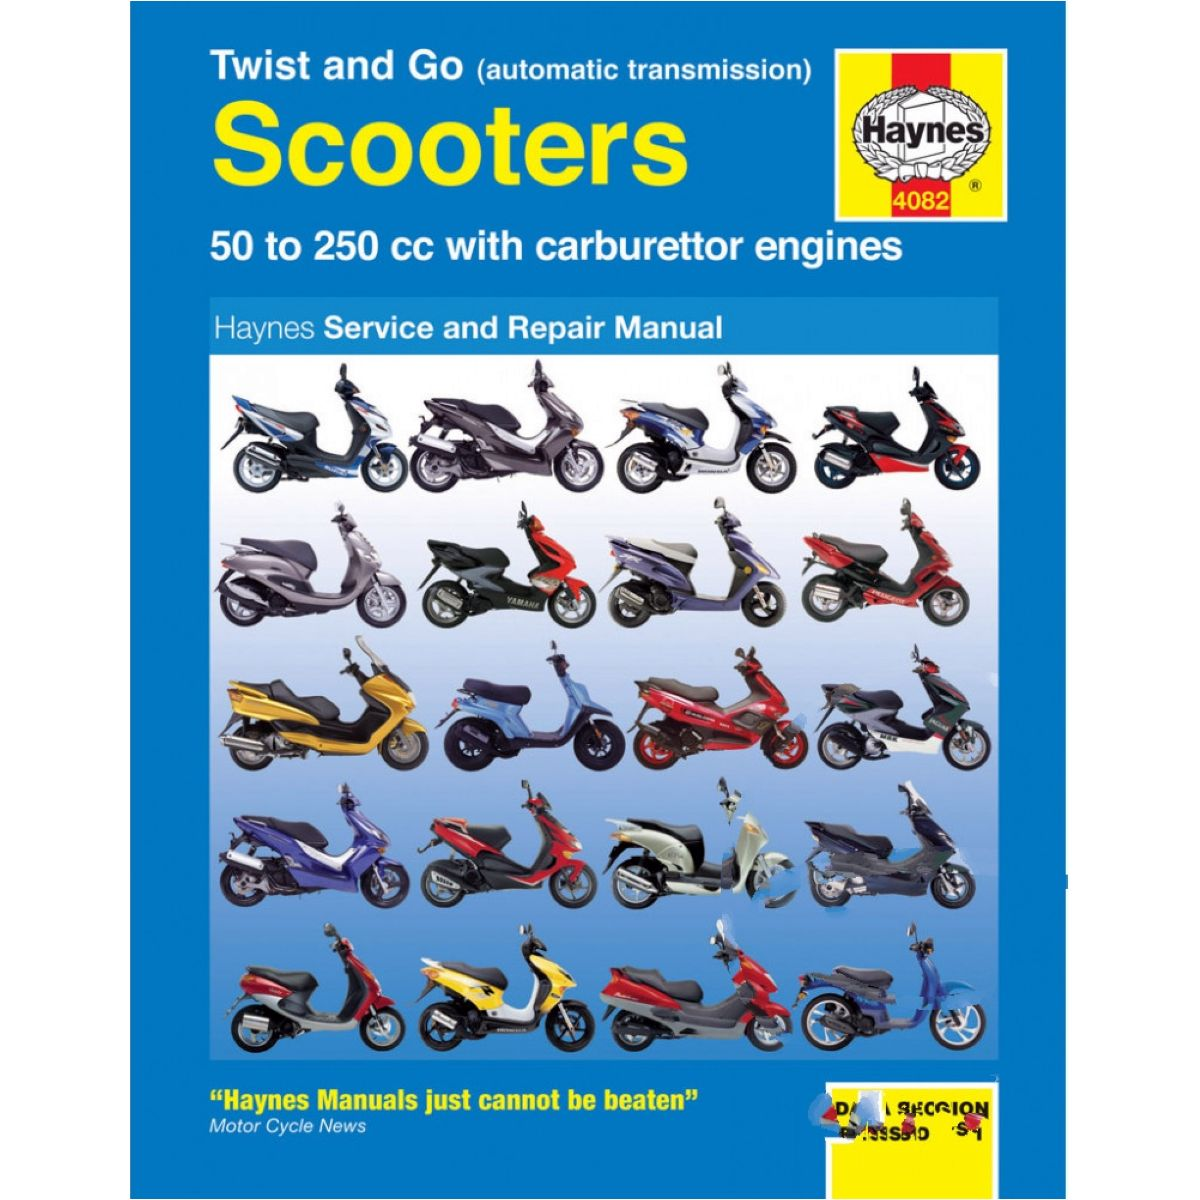 Haynes repair manual 4082 für Peugeot Jet Force C-Tech 50 VGA A1AABA  2010-2011, 4,9 PS, 3,6 kw